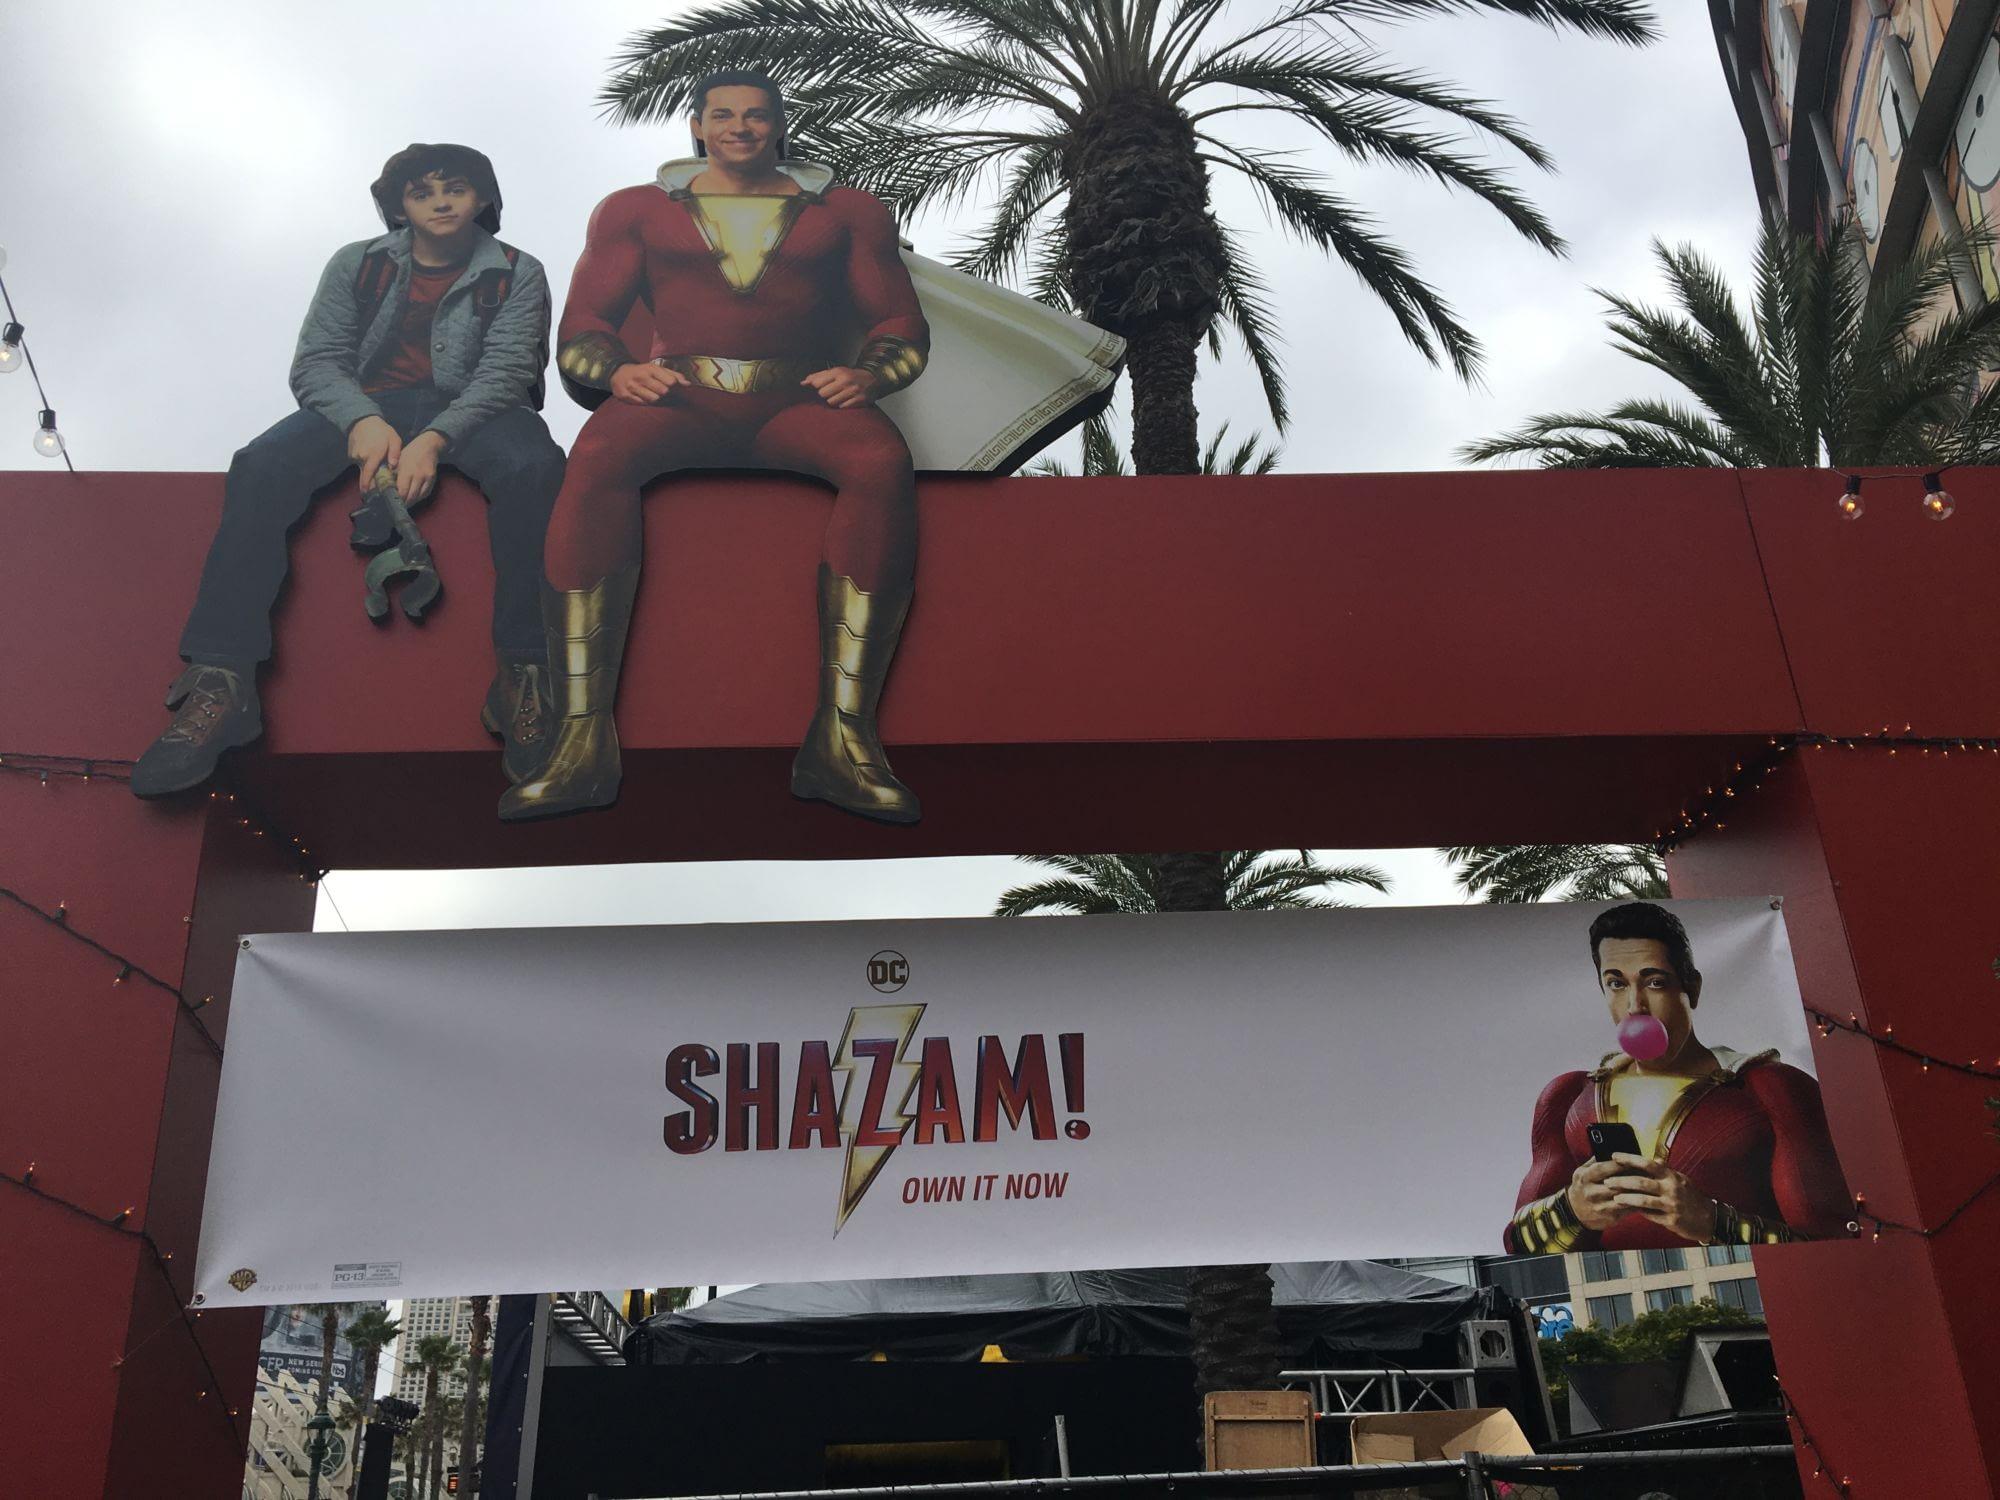 Say His Name - Shazam and Chilladelphia